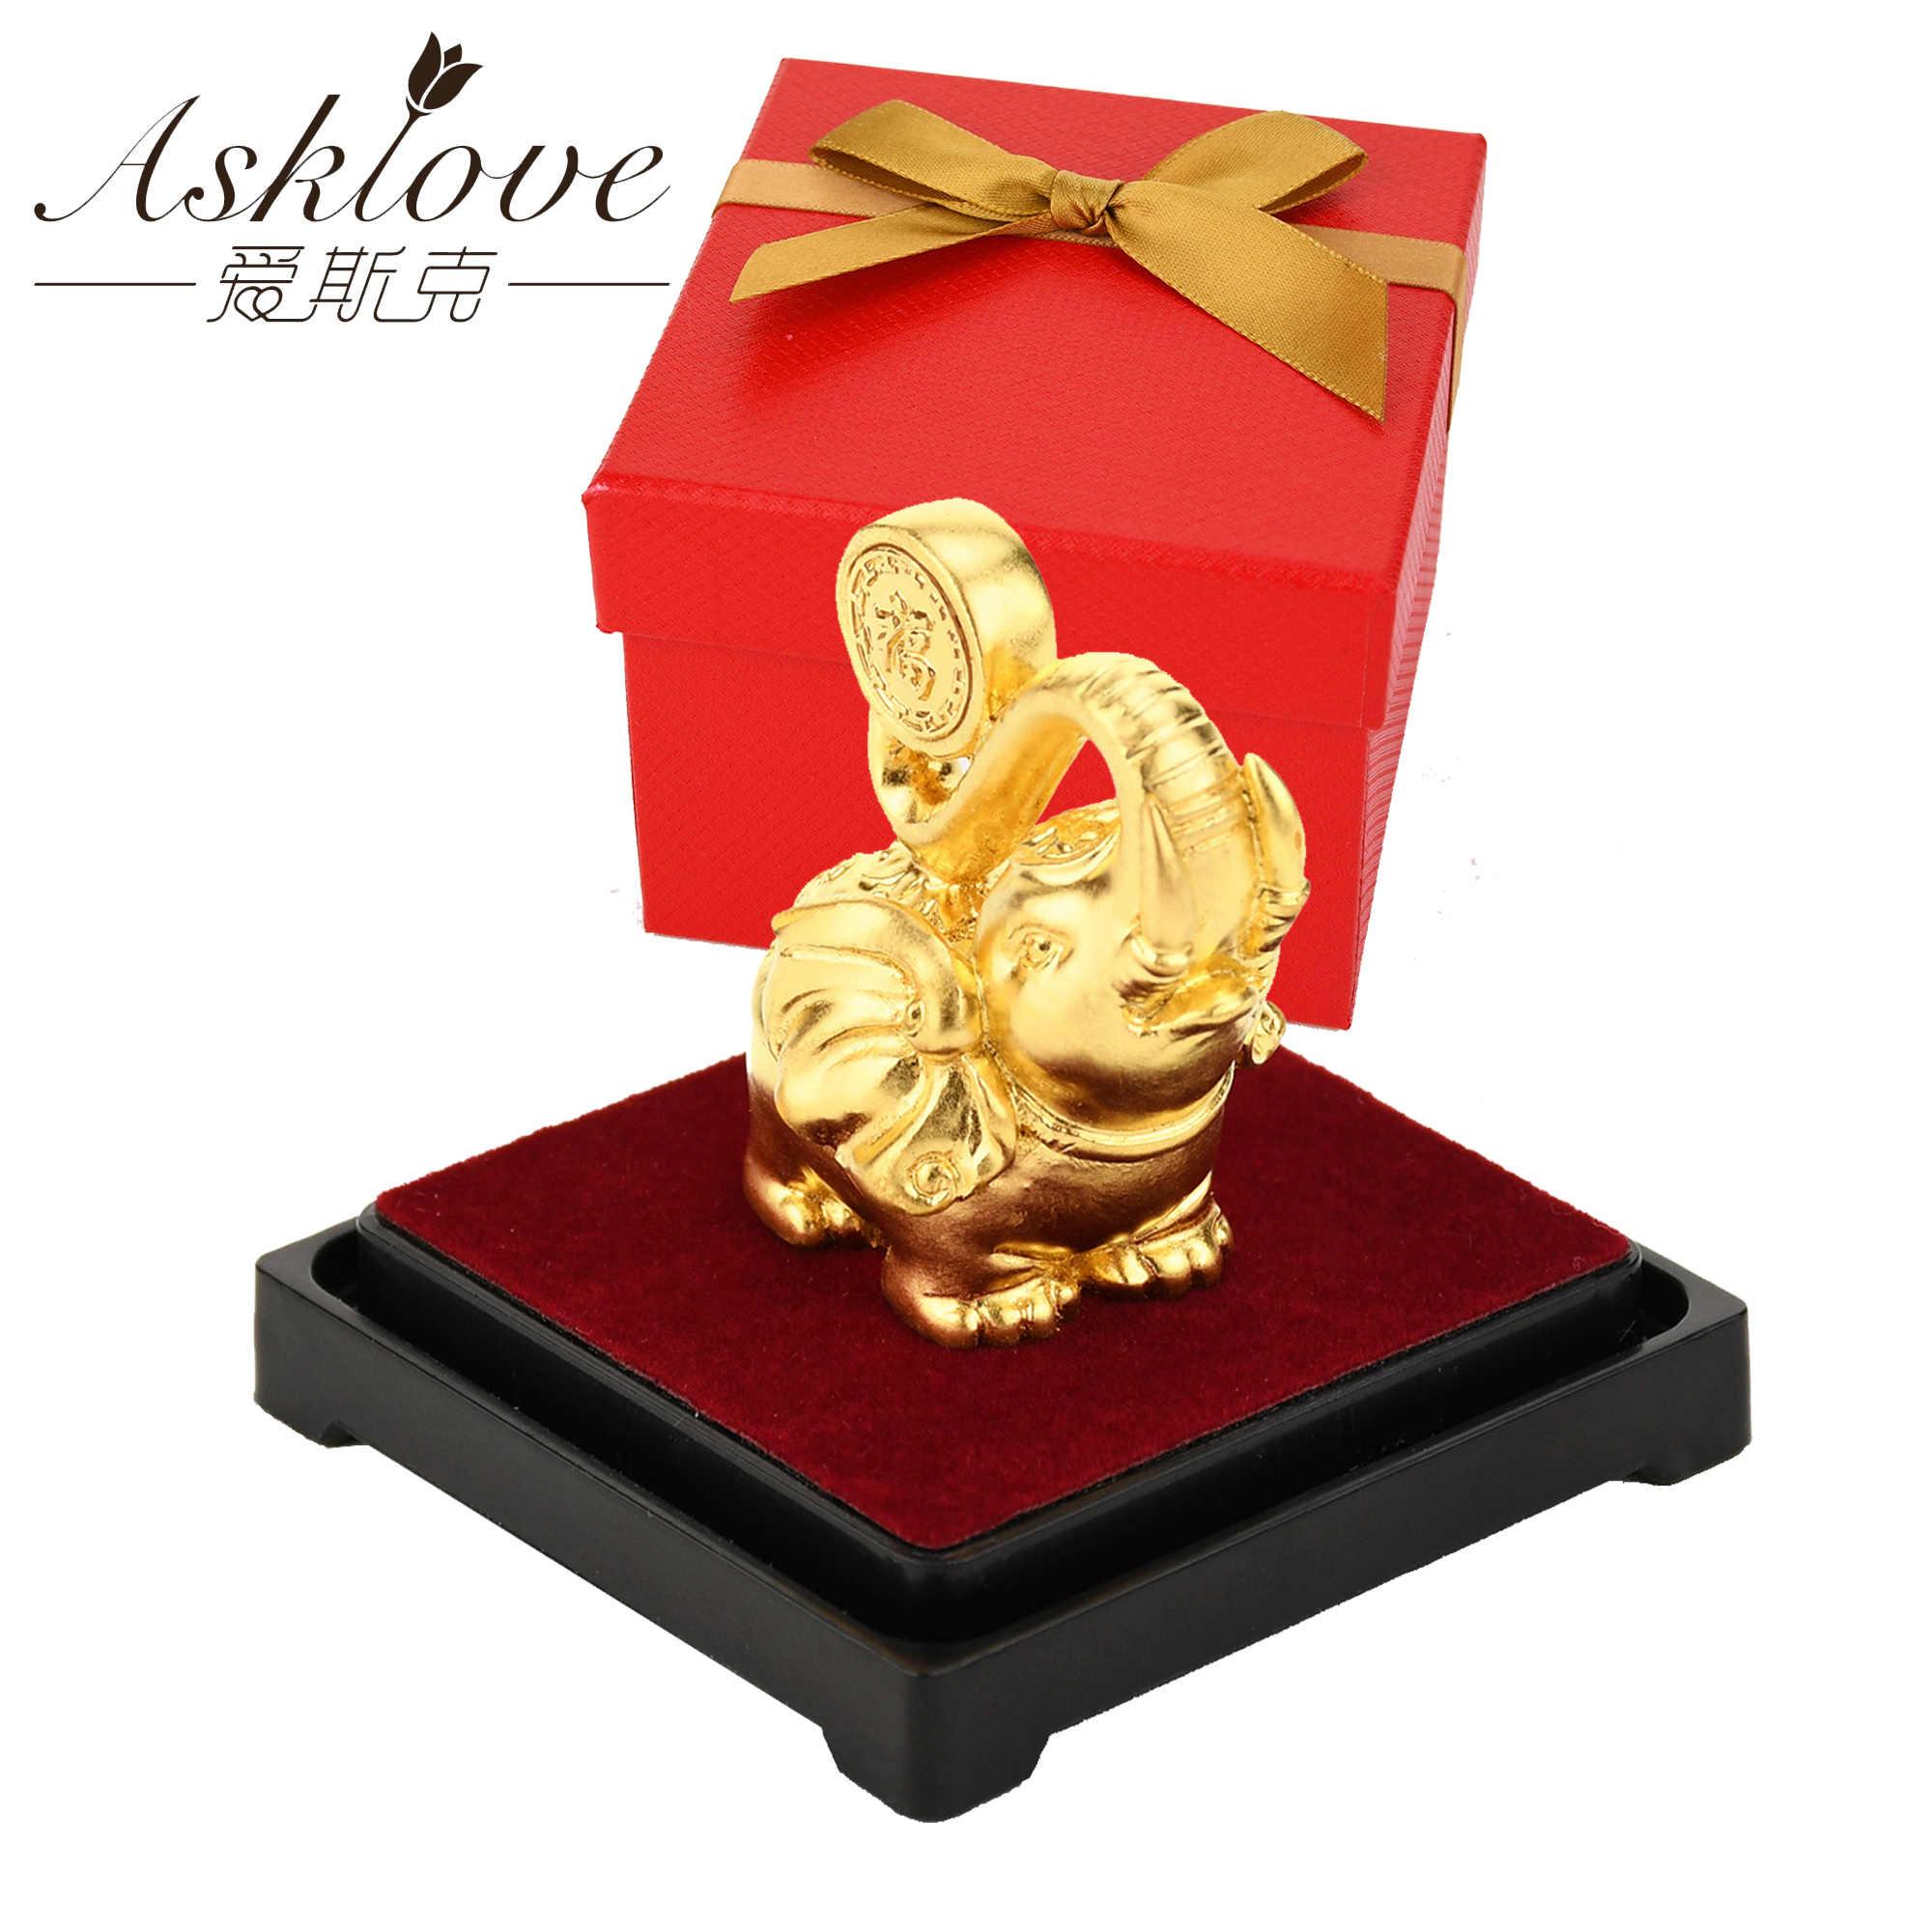 Lucky Olifant Feng Shui Decor 24K Goud Folie Olifant Standbeeld Figurine Kantoor Ornament Ambachten Verzamelen Rijkdom Home Office Decor